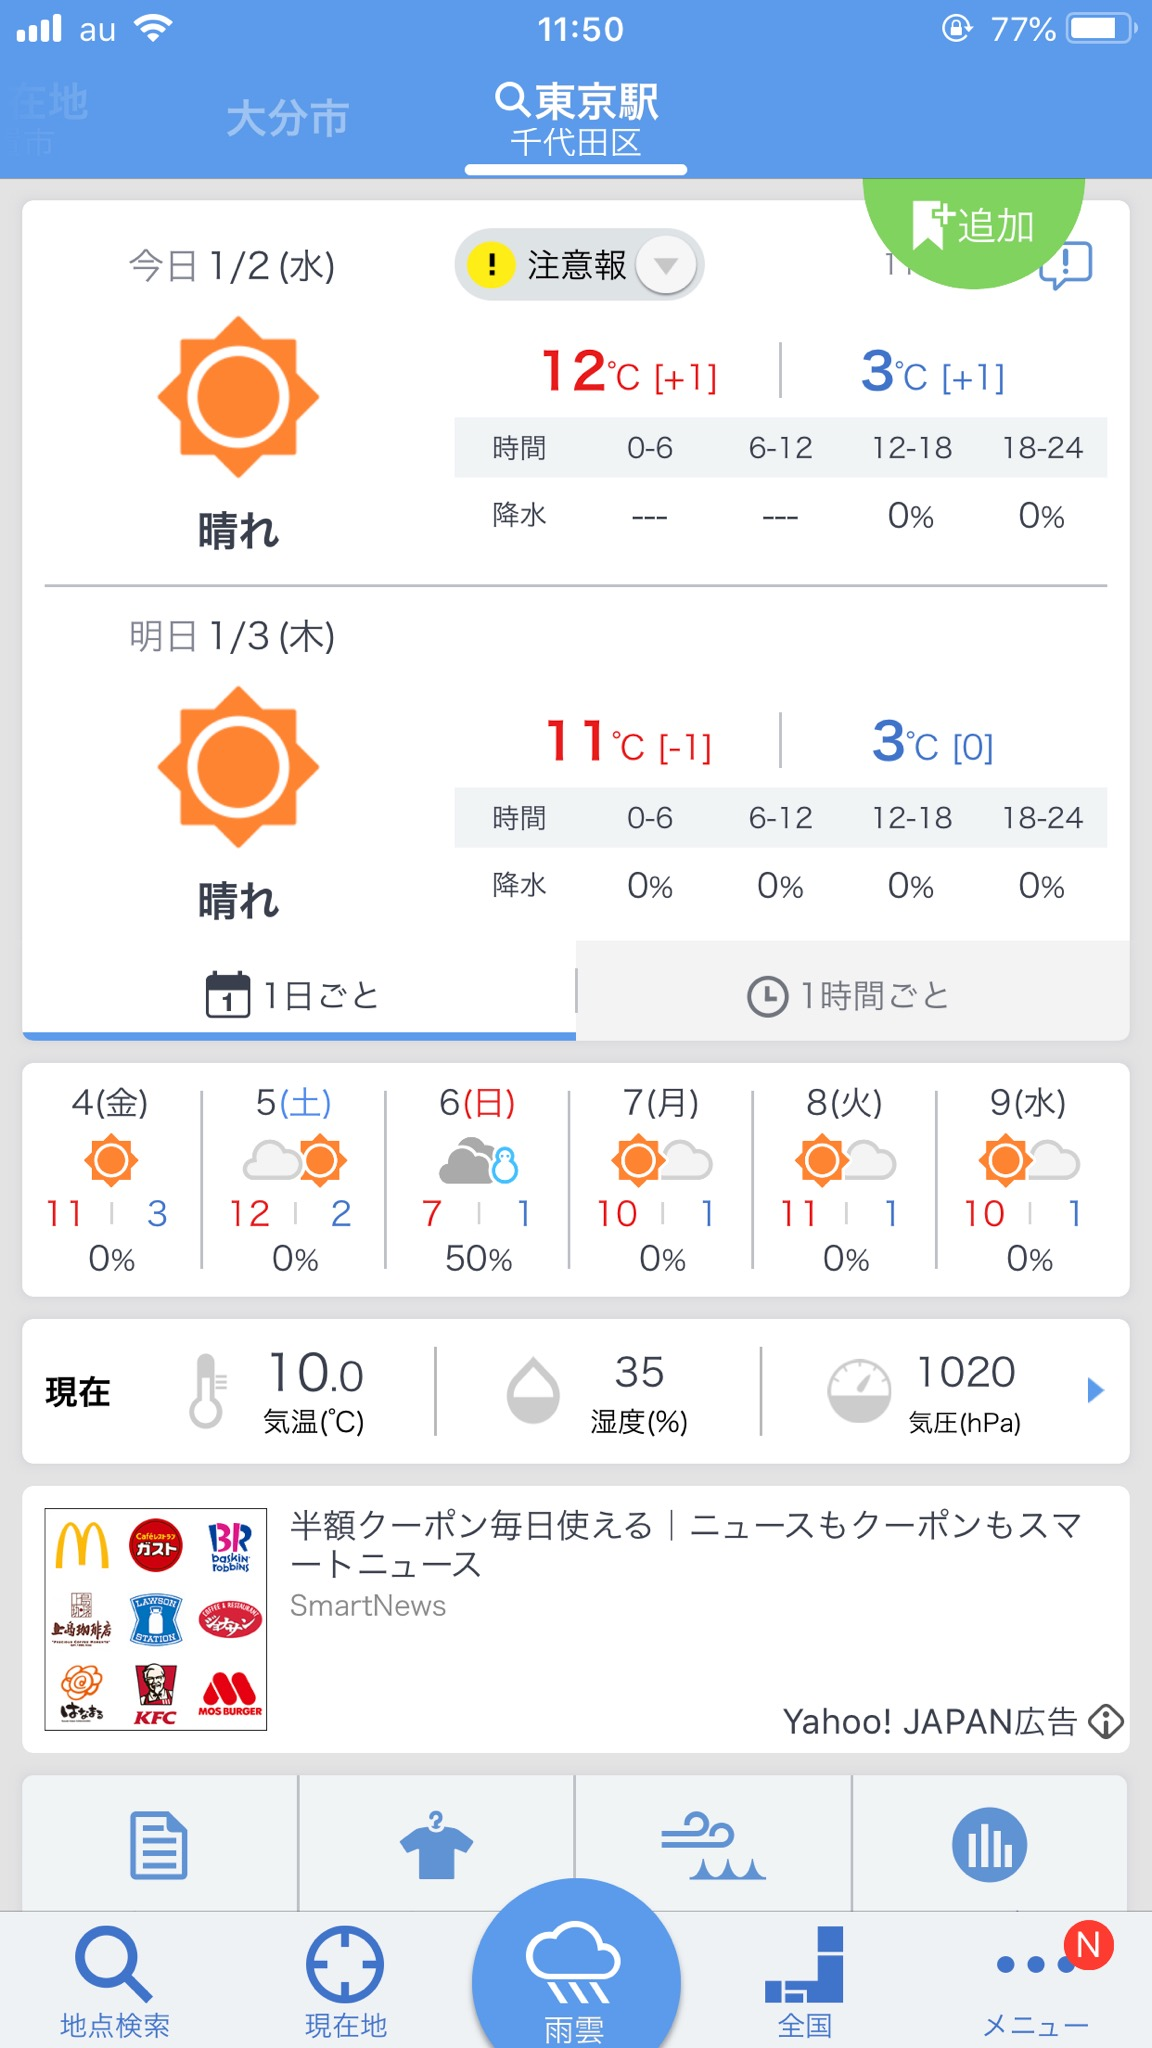 yahoo!天気アプリ